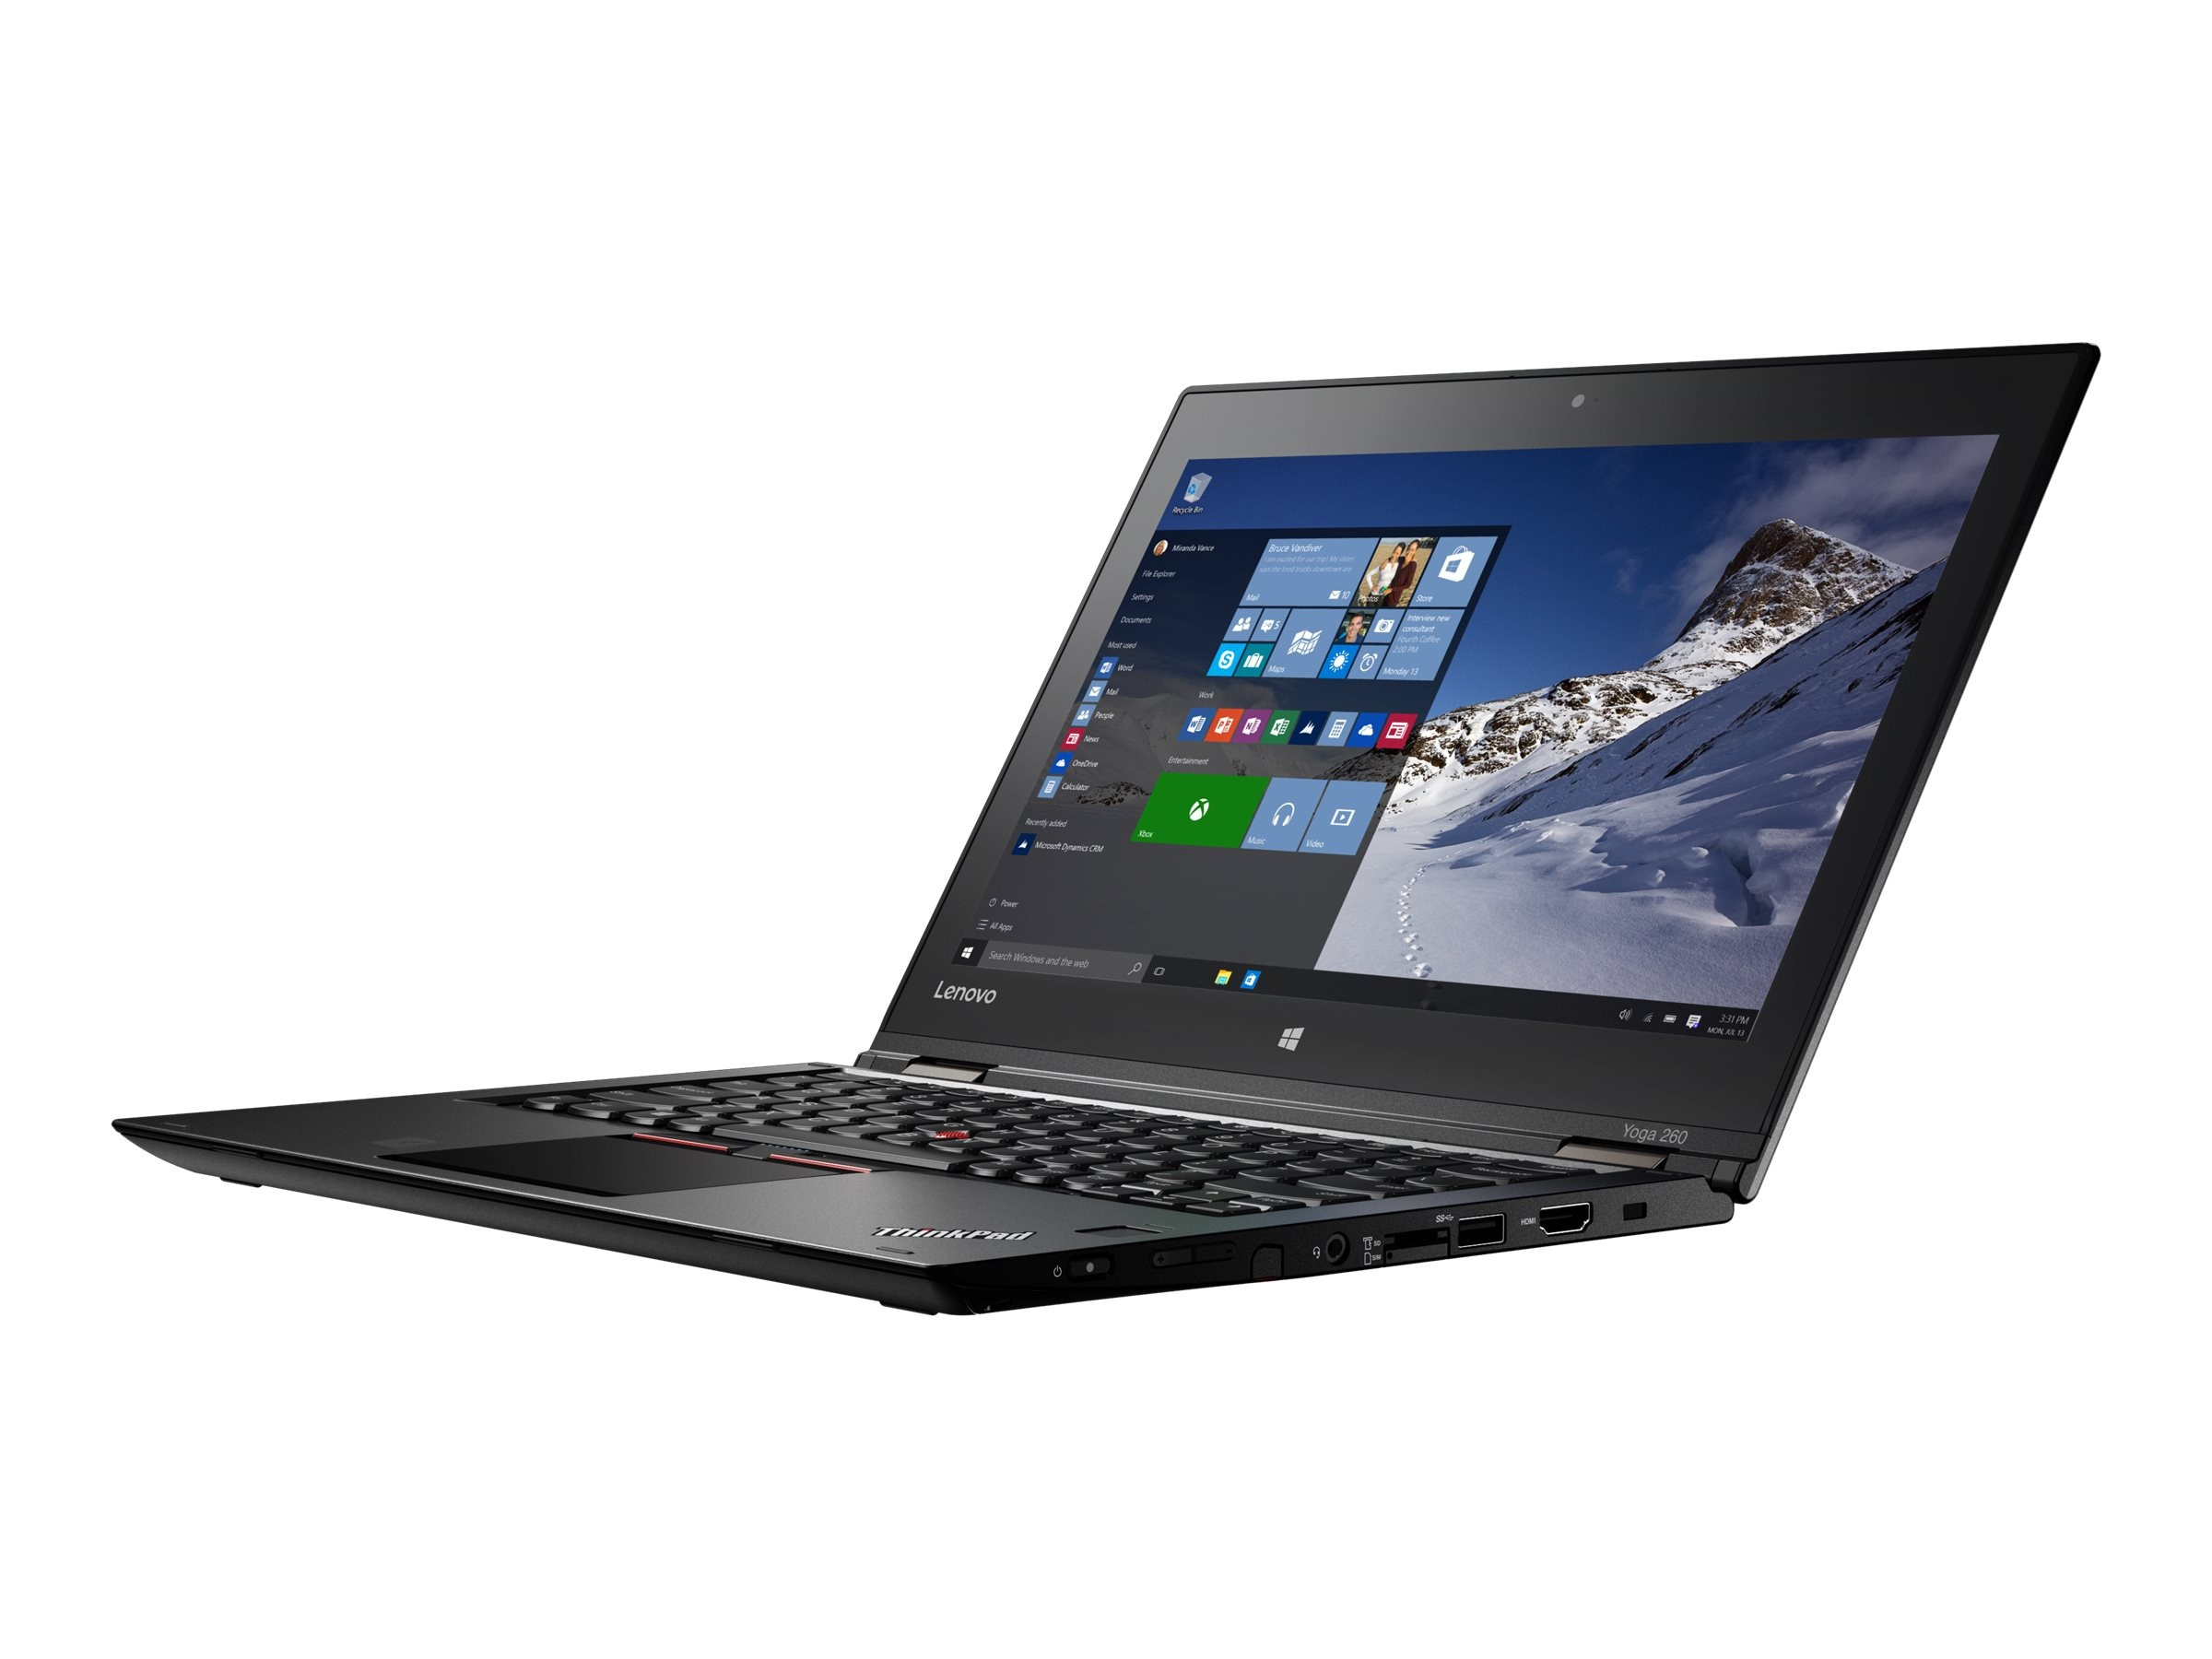 Lenovo TopSeller ThinkPad Yoga 260 Core i7-6500U 2.5GHz 8GB 256GB OPAL2 ac BT FR WC 4C 12.5 FHD MT W10P64, 20FD002CUS, 31221295, Notebooks - Convertible